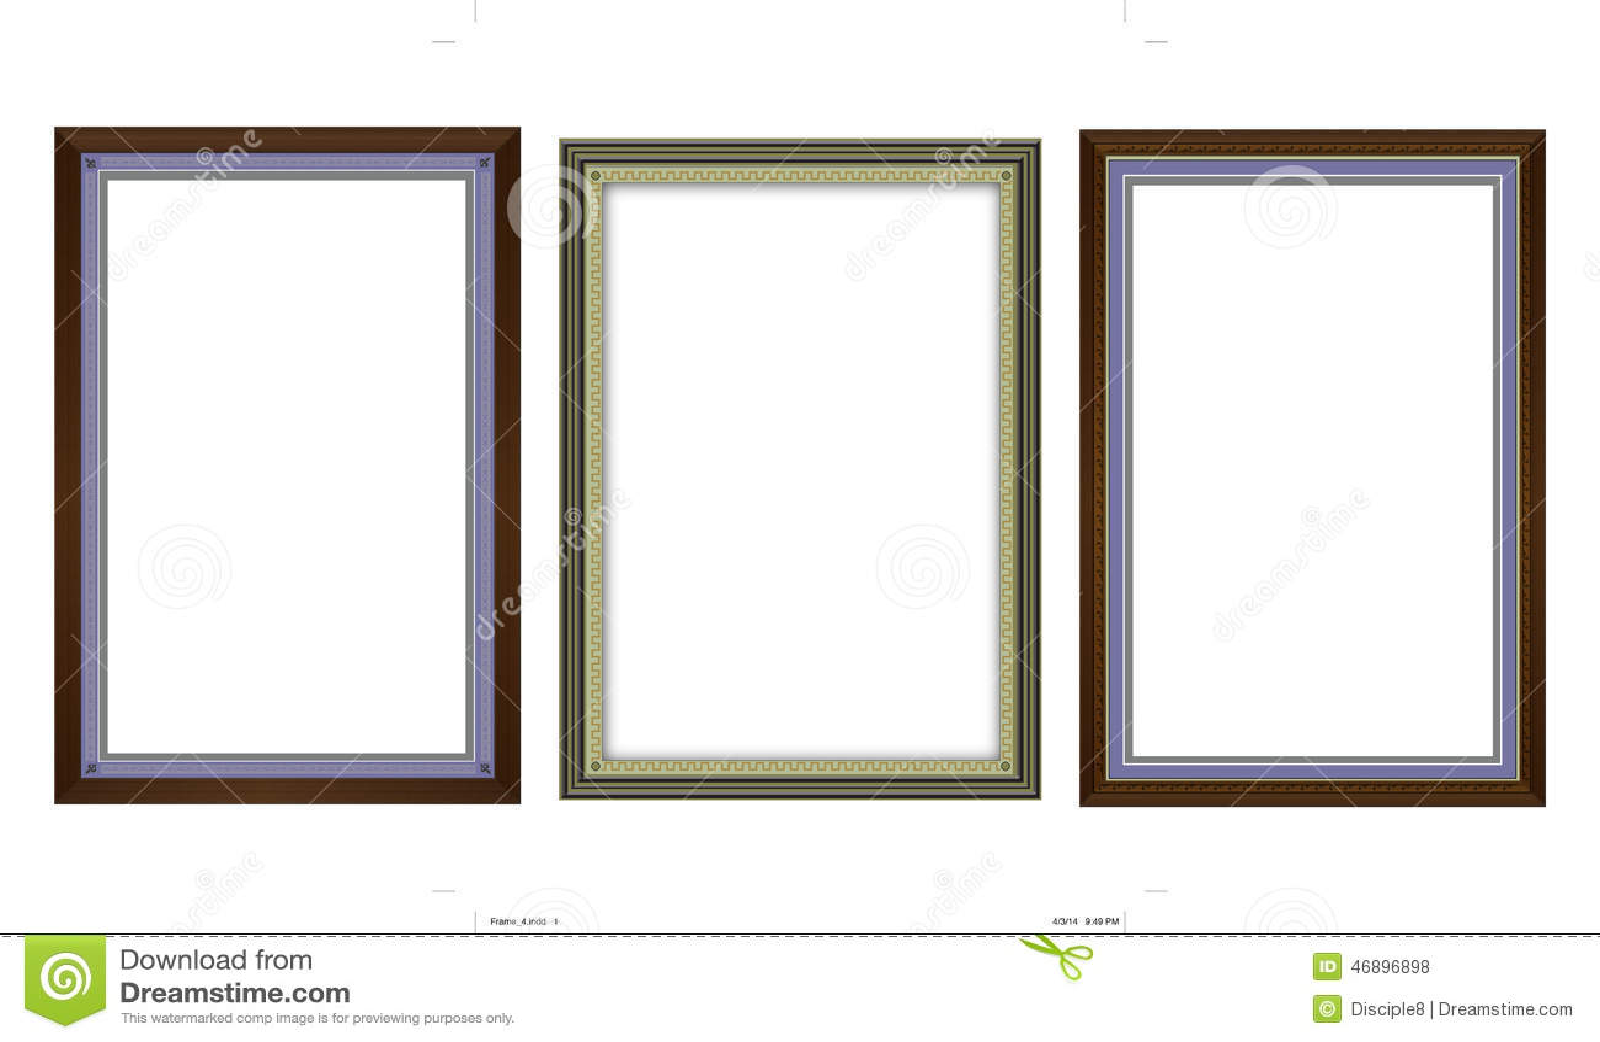 classically designs elegant formal frames illustrations original ...